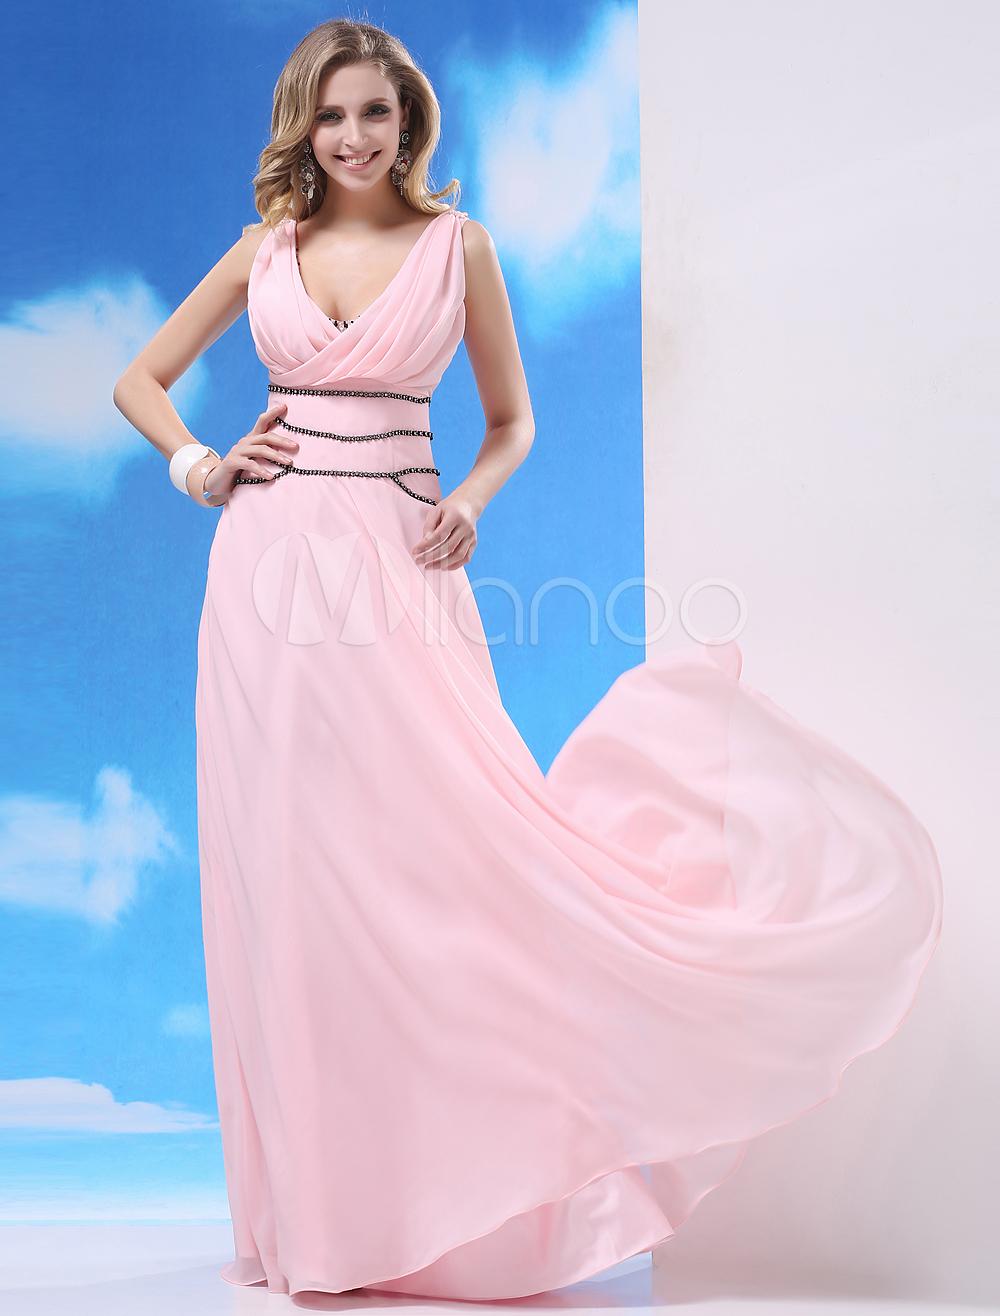 Chiffon Evening Dress Soft Pink V Neck Beaded Prom Dress Sleeveless Pleated A Line Floor Length Party Dress Milanoo